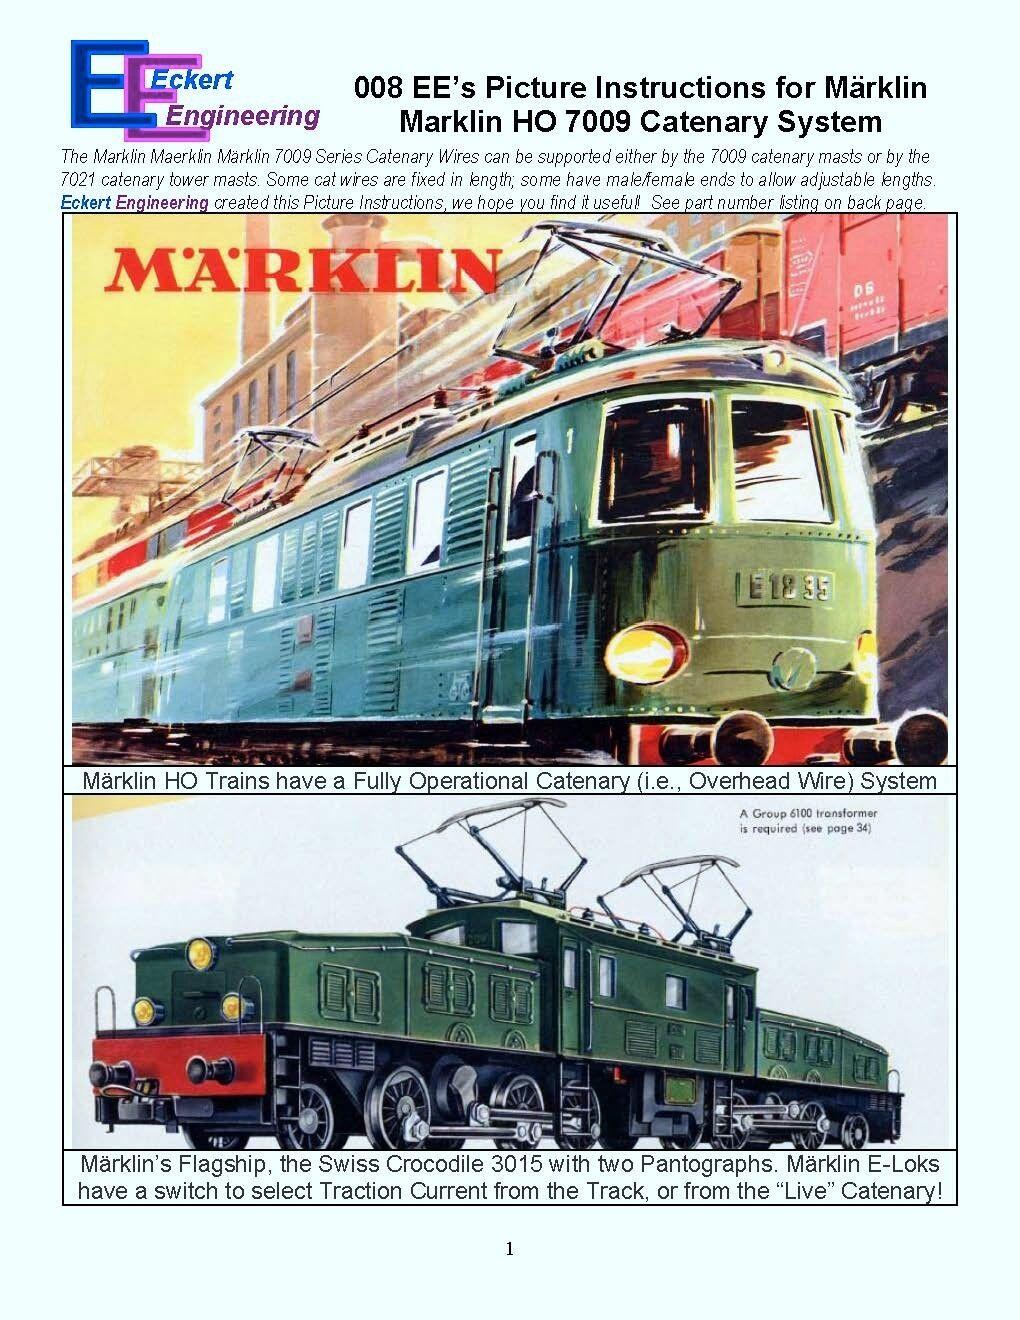 marklin ho 7016 catenary cross span section 14\u201d long pk of 5 lnc ebay bachmann wiring diagrams norton secured powered by verisign